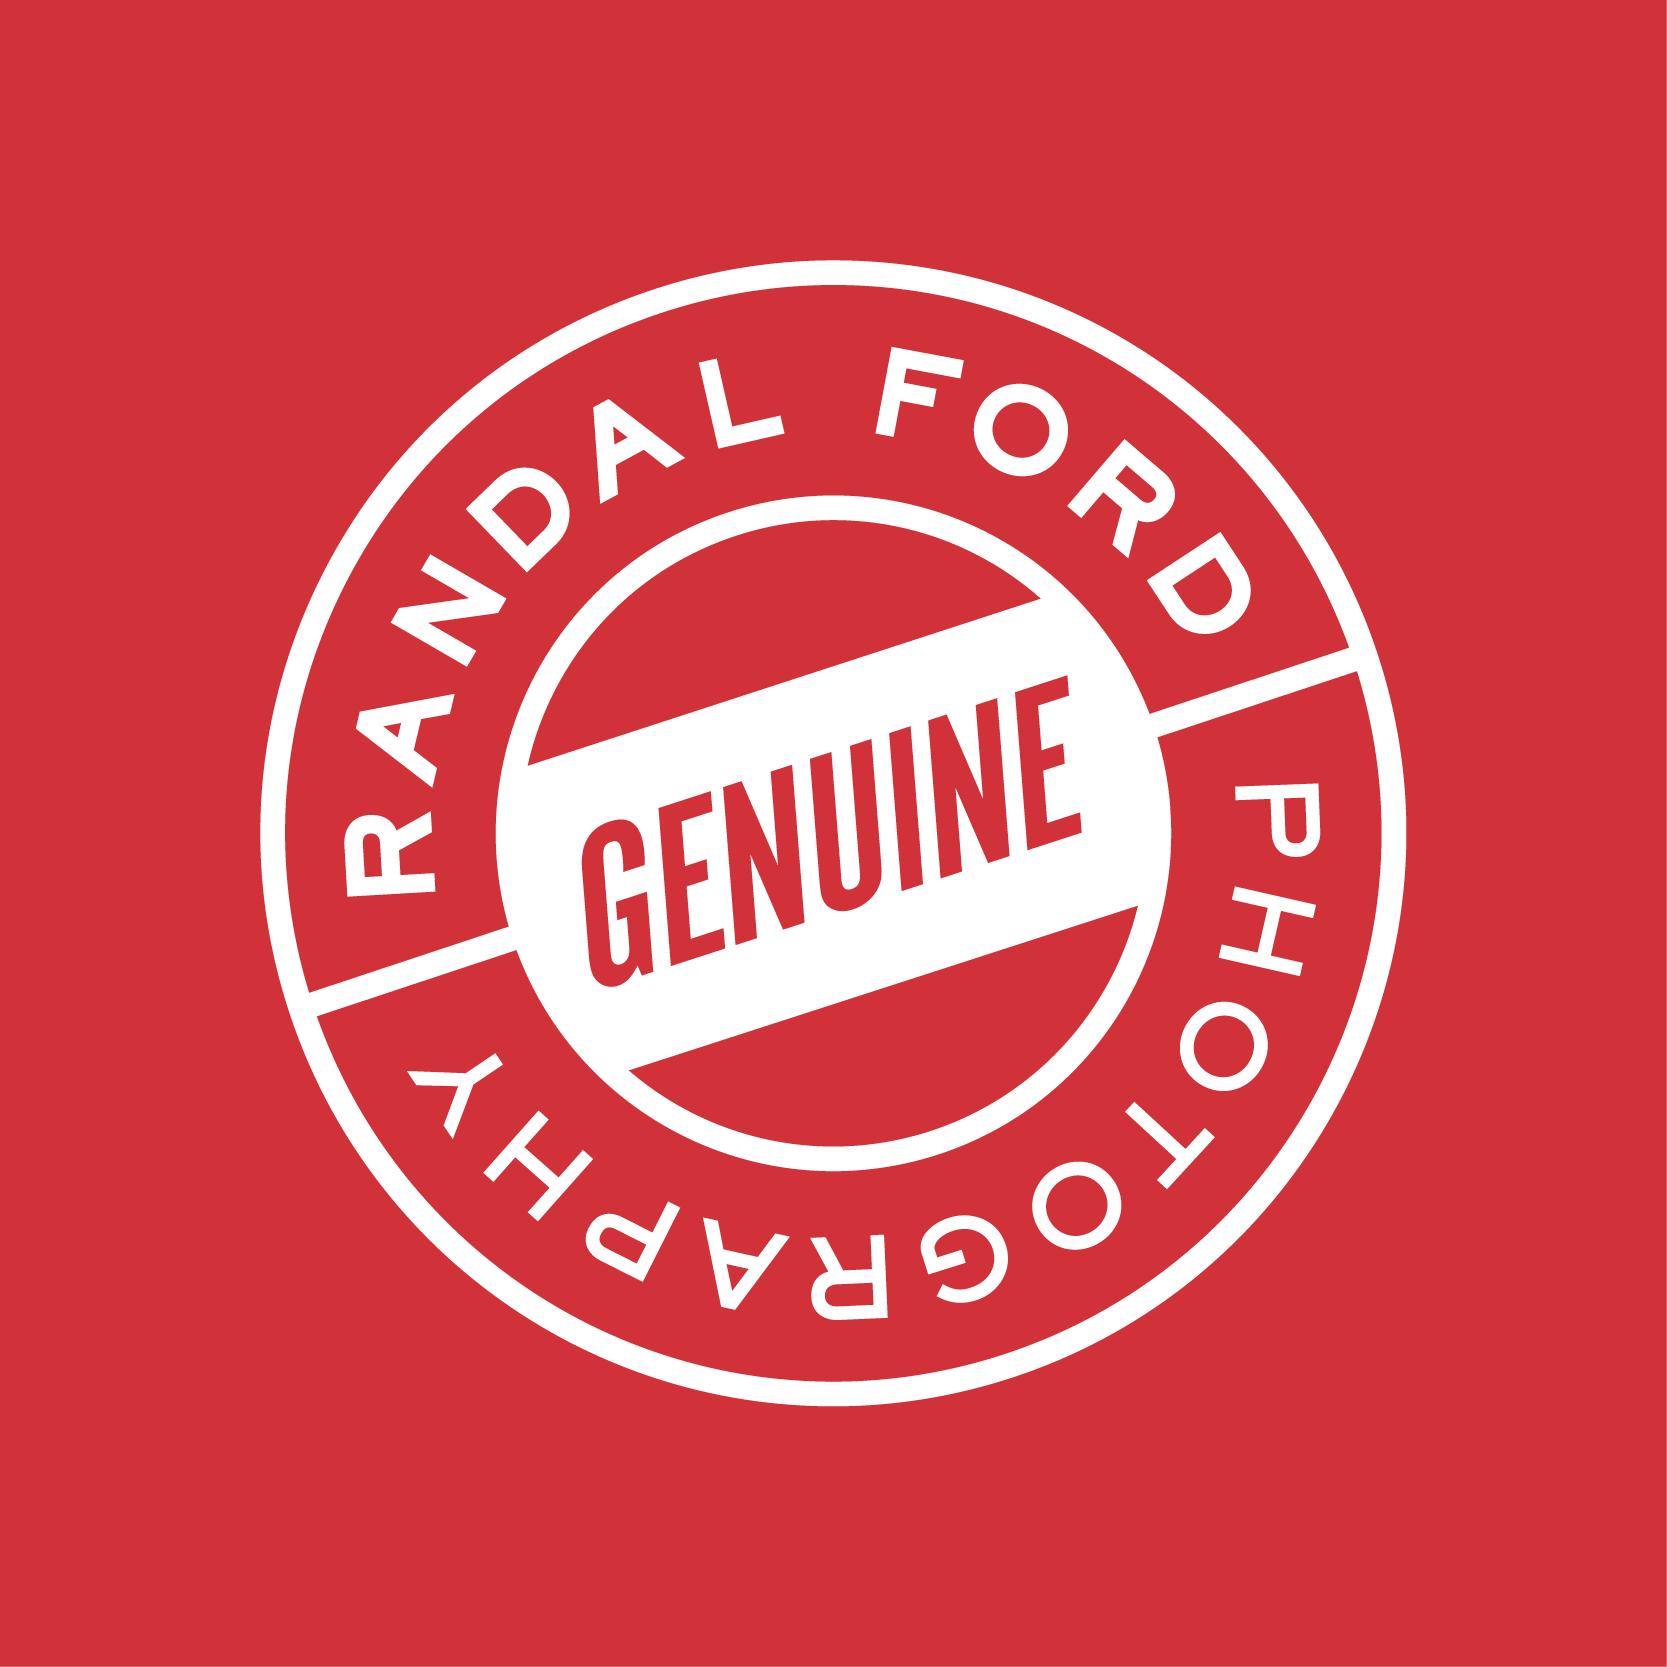 logo-randal_v copy 2.png